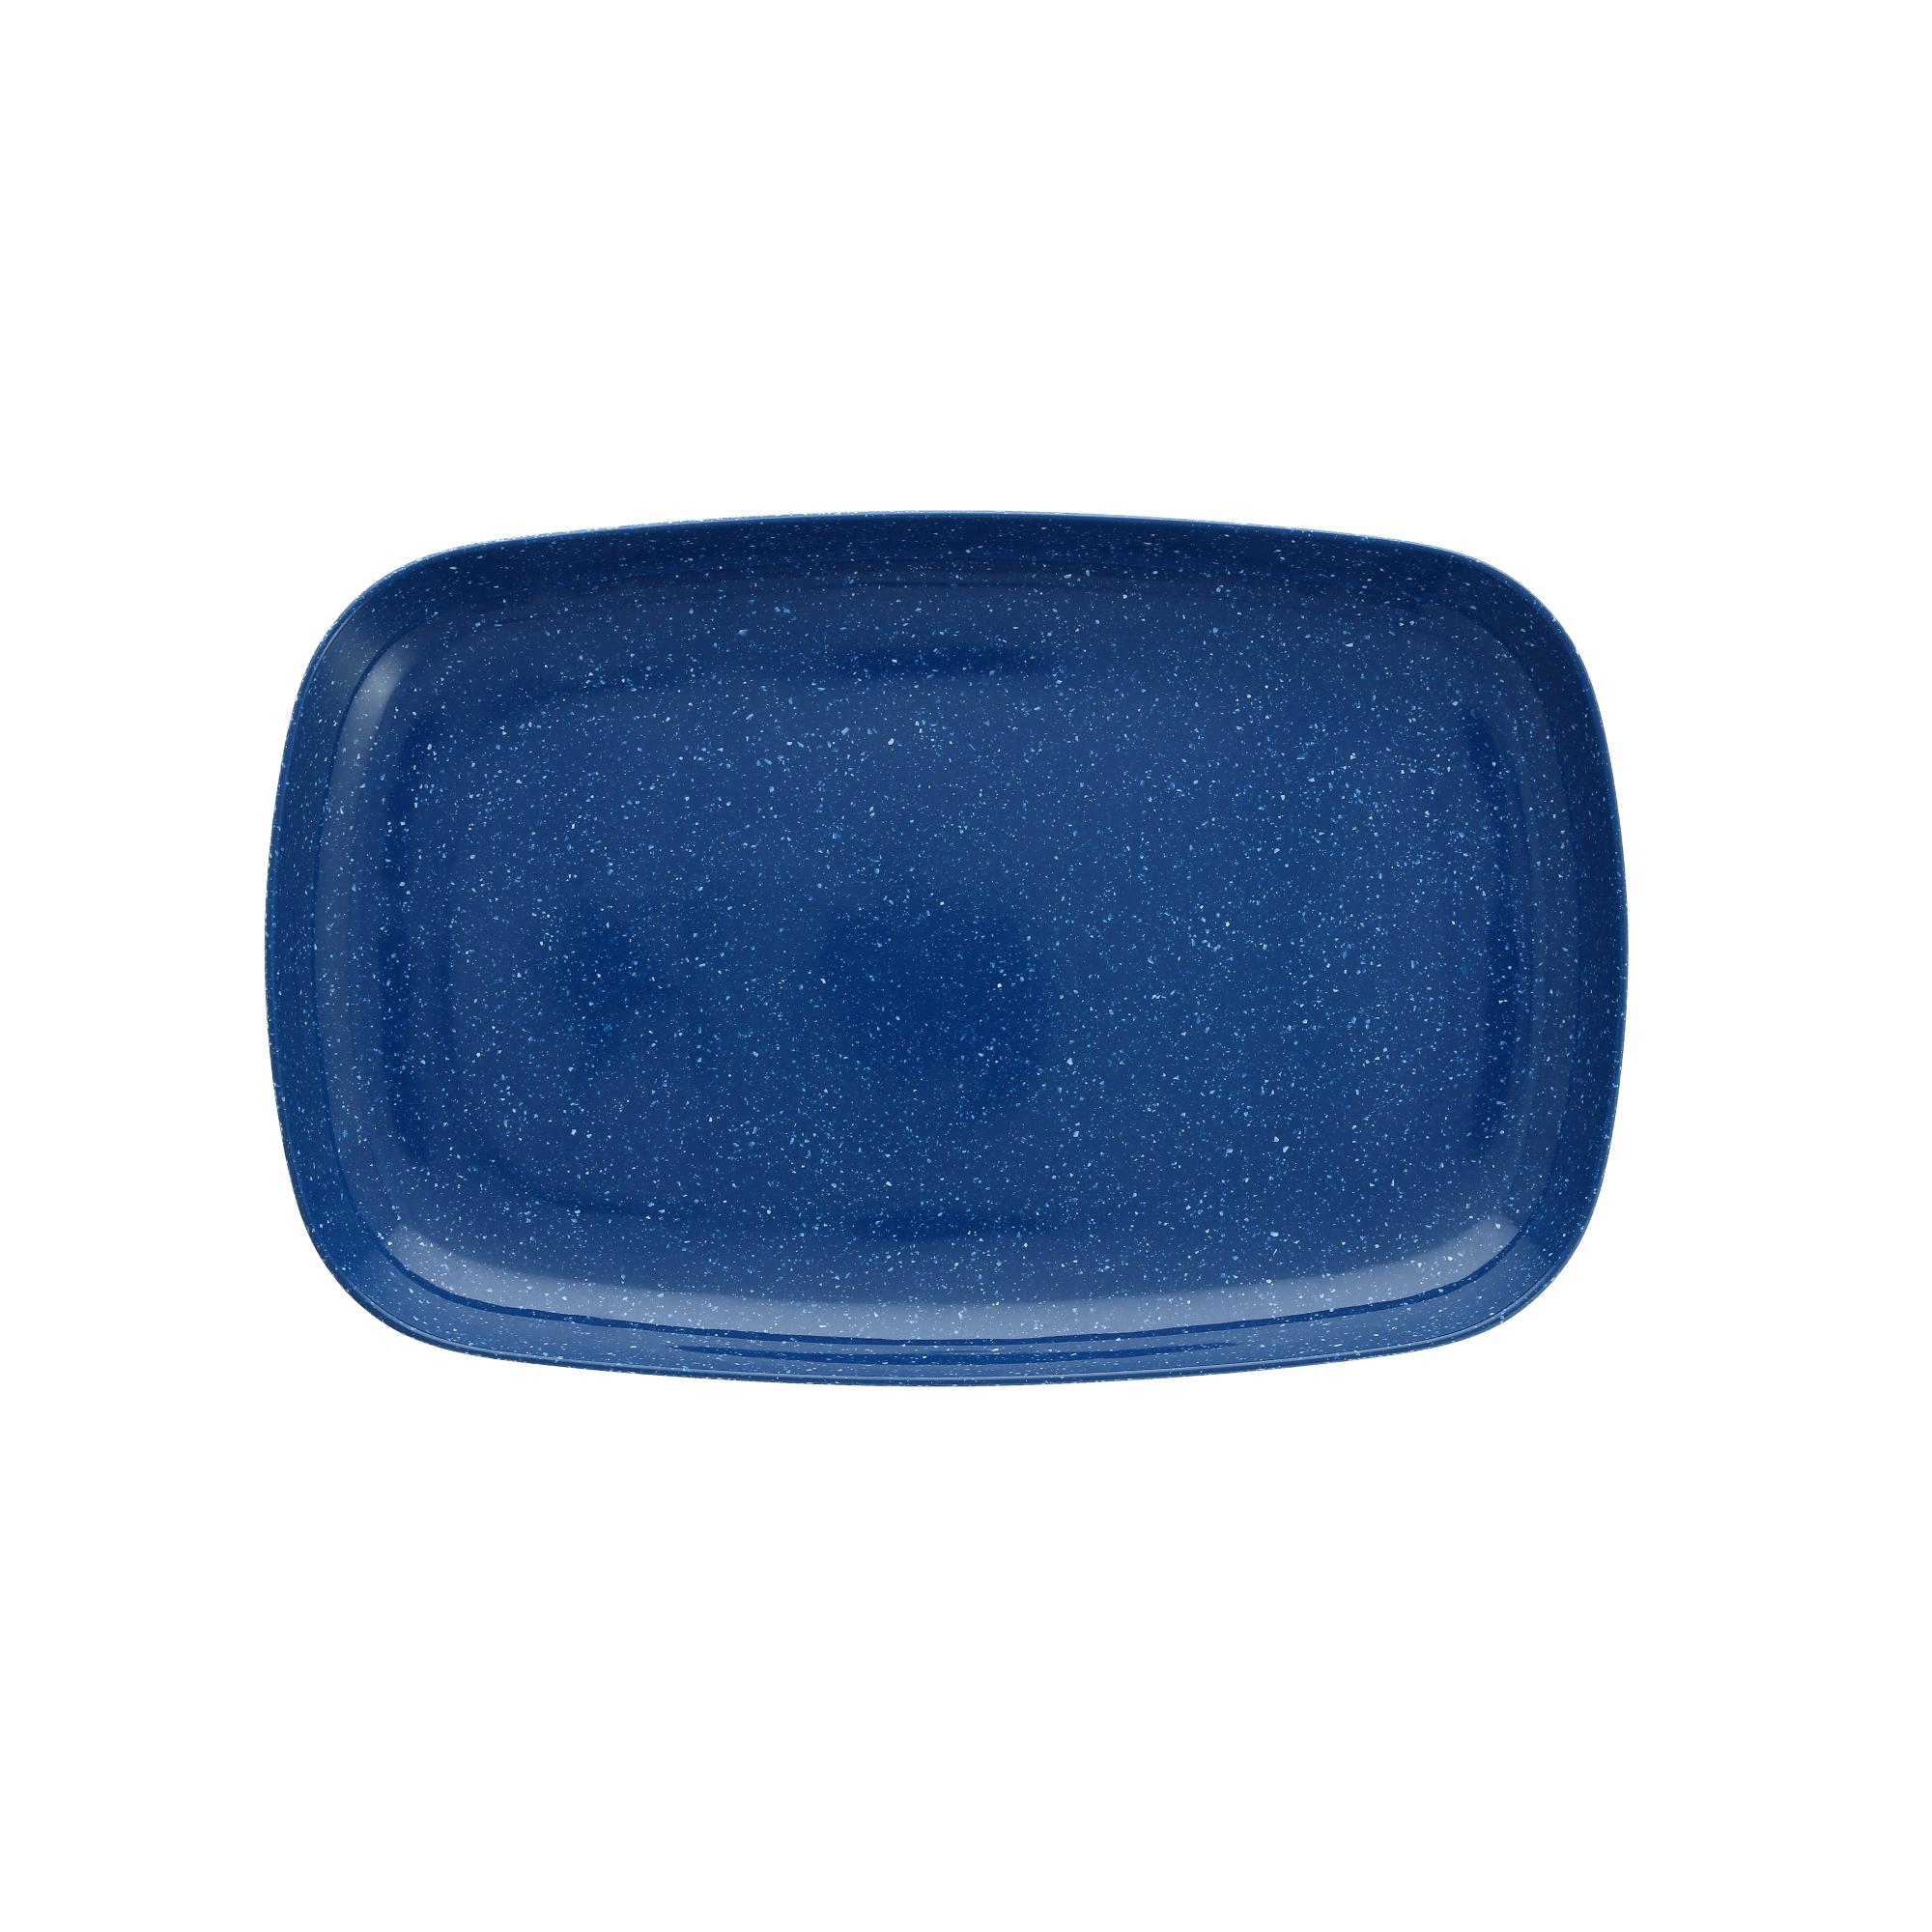 Fortessa Camp Blue Melamine Rectangular Coupe Platter, Set of 4